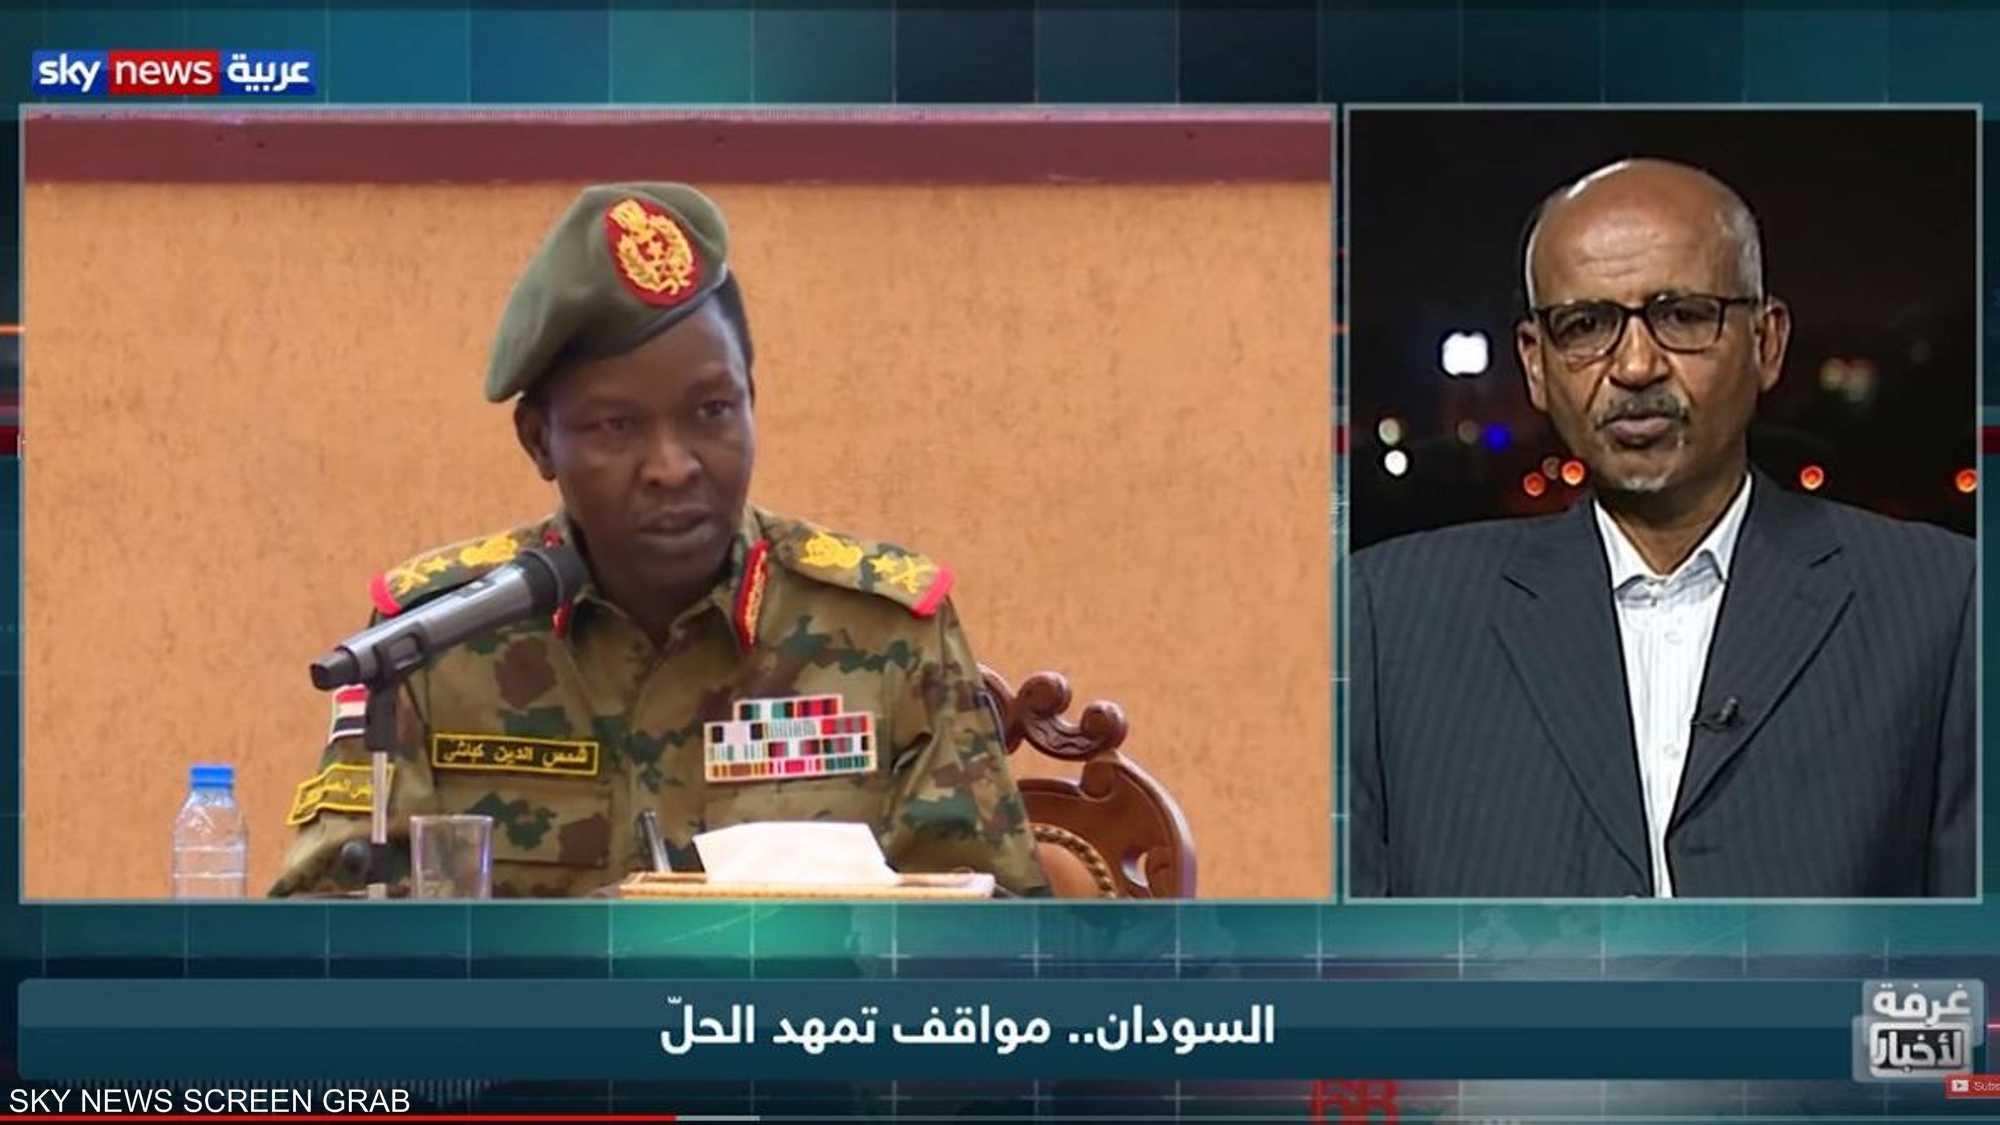 السودان.. مواقف تمهد الحل